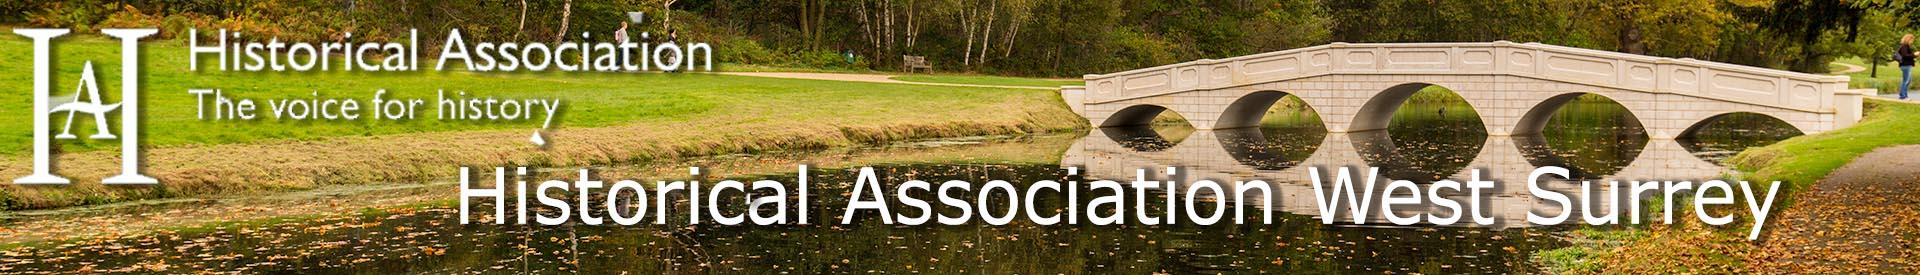 West Surrey Historical Association